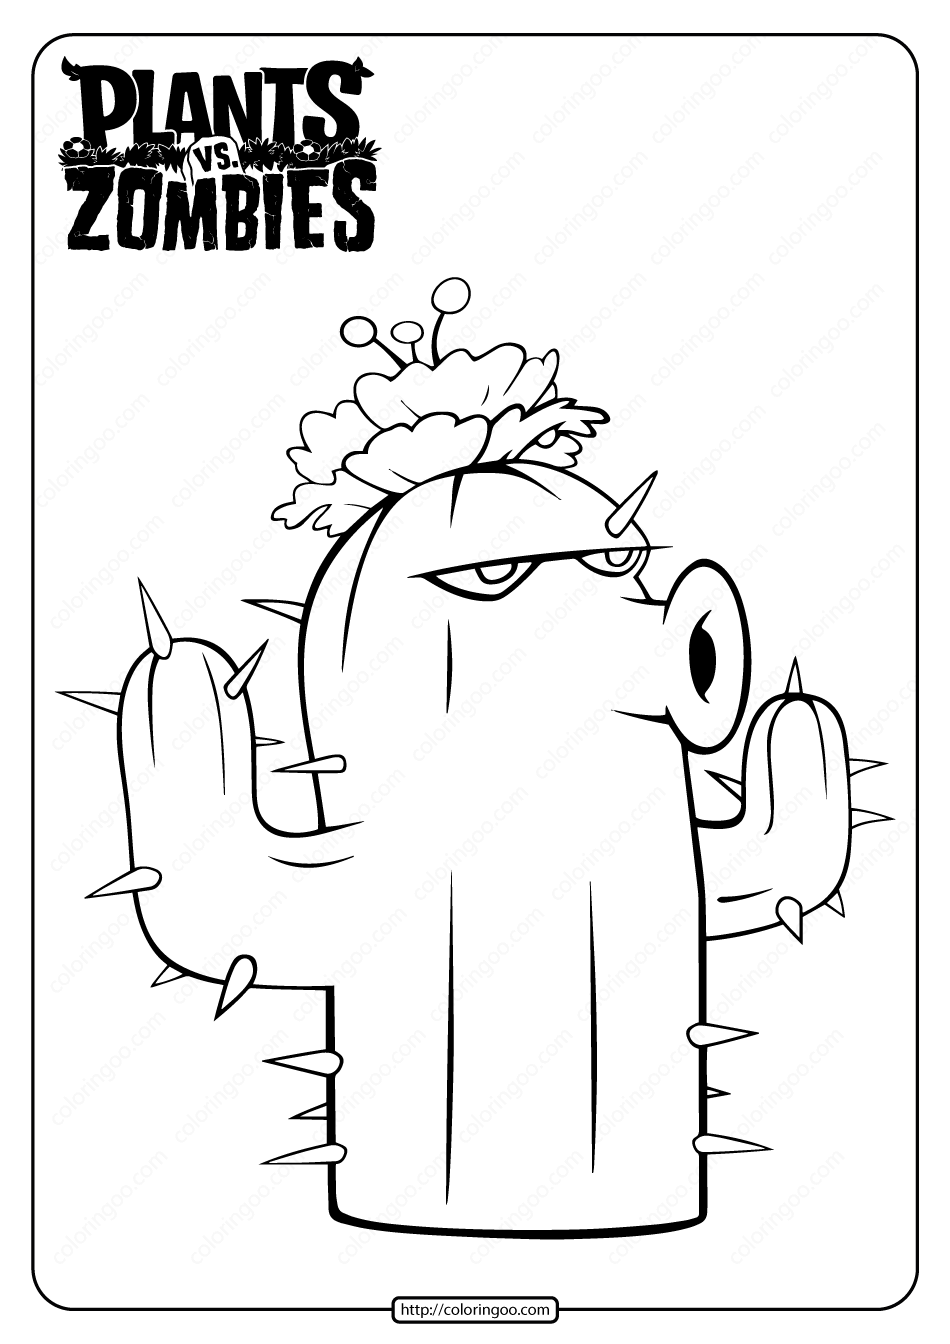 Free Plants Vs Zombies Cactus Pdf Coloring Page In 2021 Plants Vs Zombies Plant Zombie Free Plants